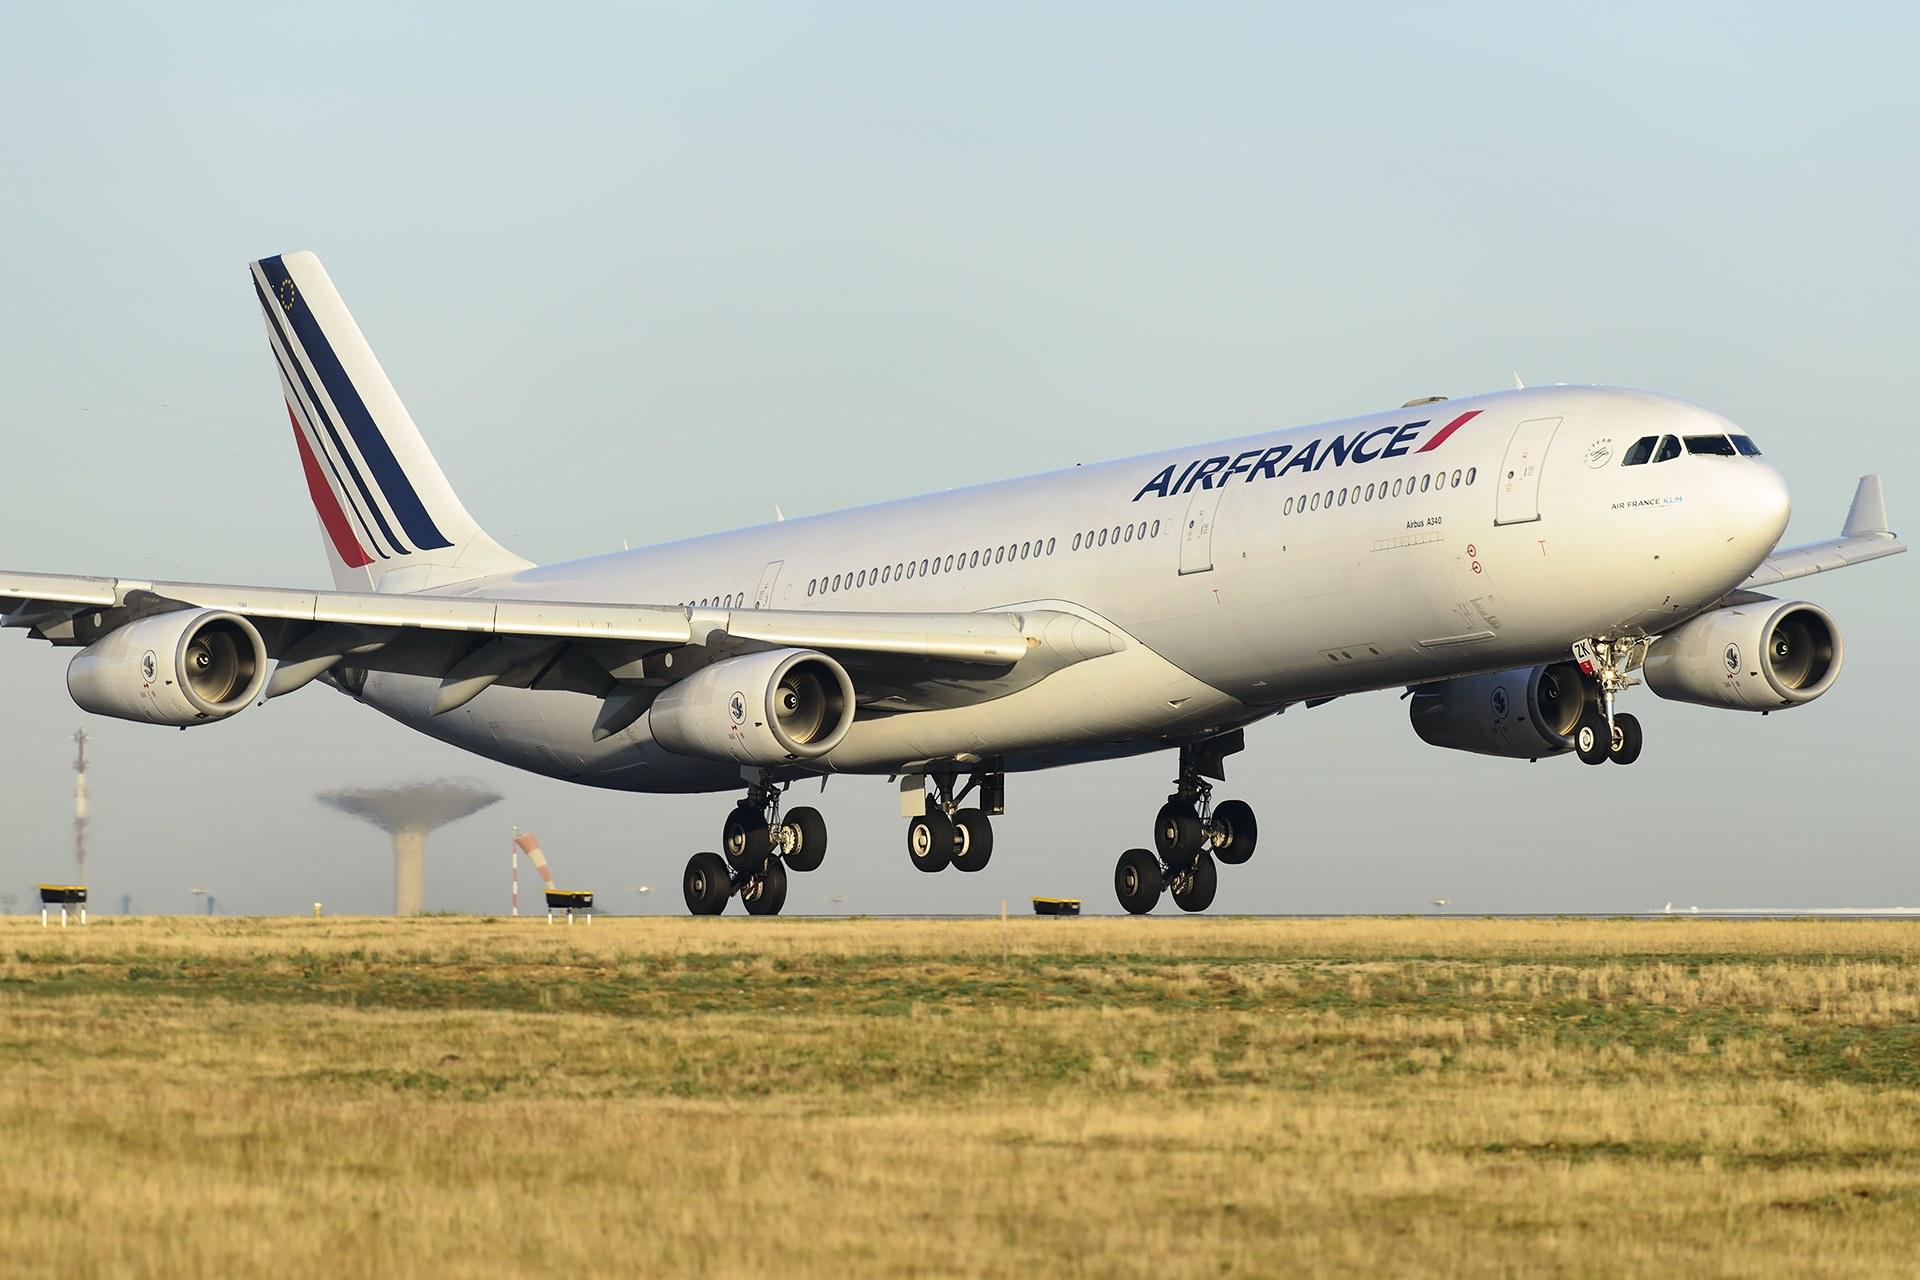 Airbus A340-300 à l'atterrissage